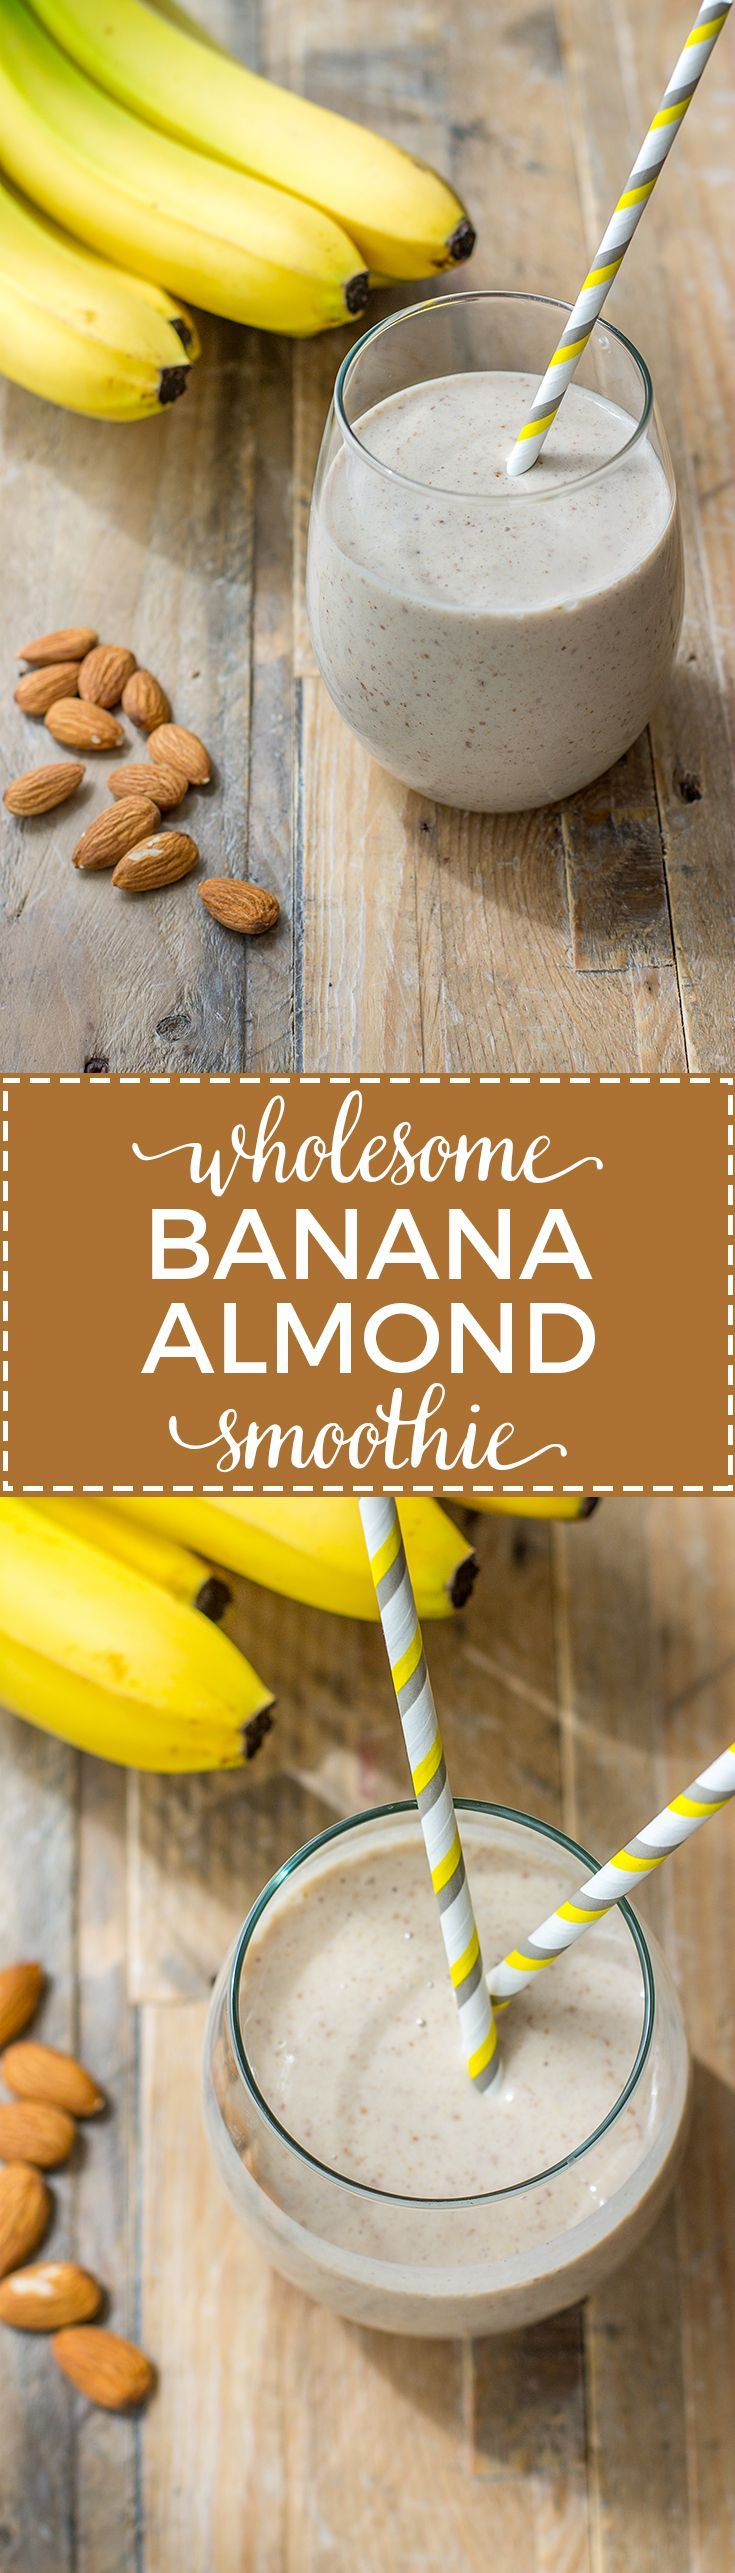 Wholesome banana almond milk smoothie with flax seeds, vanilla, and cinnamon. Like a healthy milkshake! via @nourishandfete